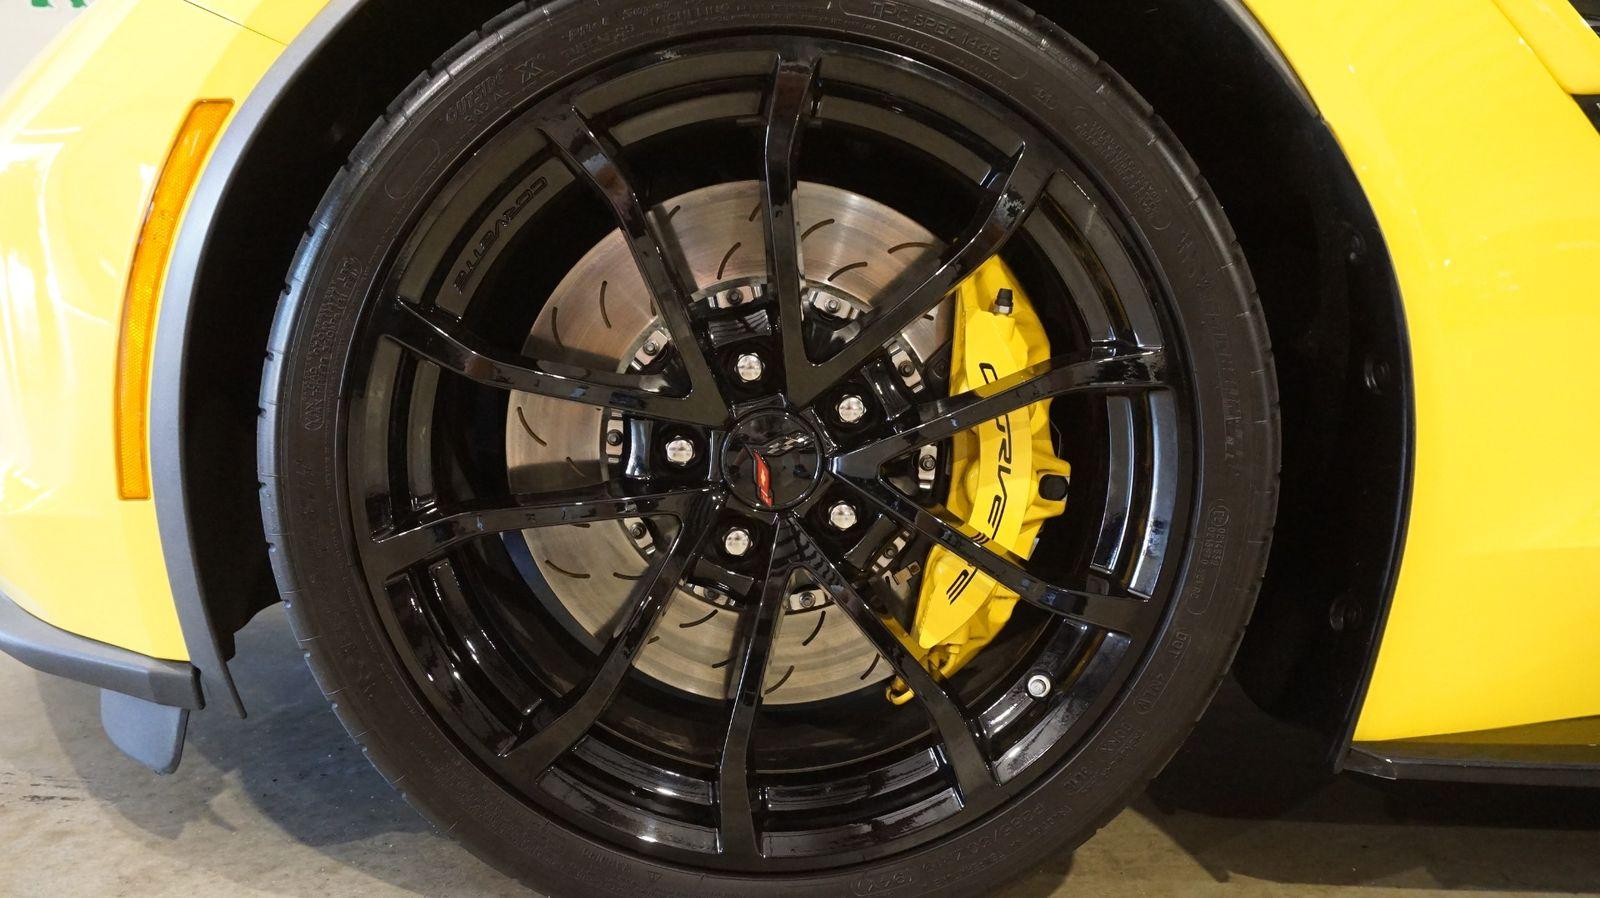 2017 Yellow Chevrolet Corvette Grand Sport 1LT | C7 Corvette Photo 10